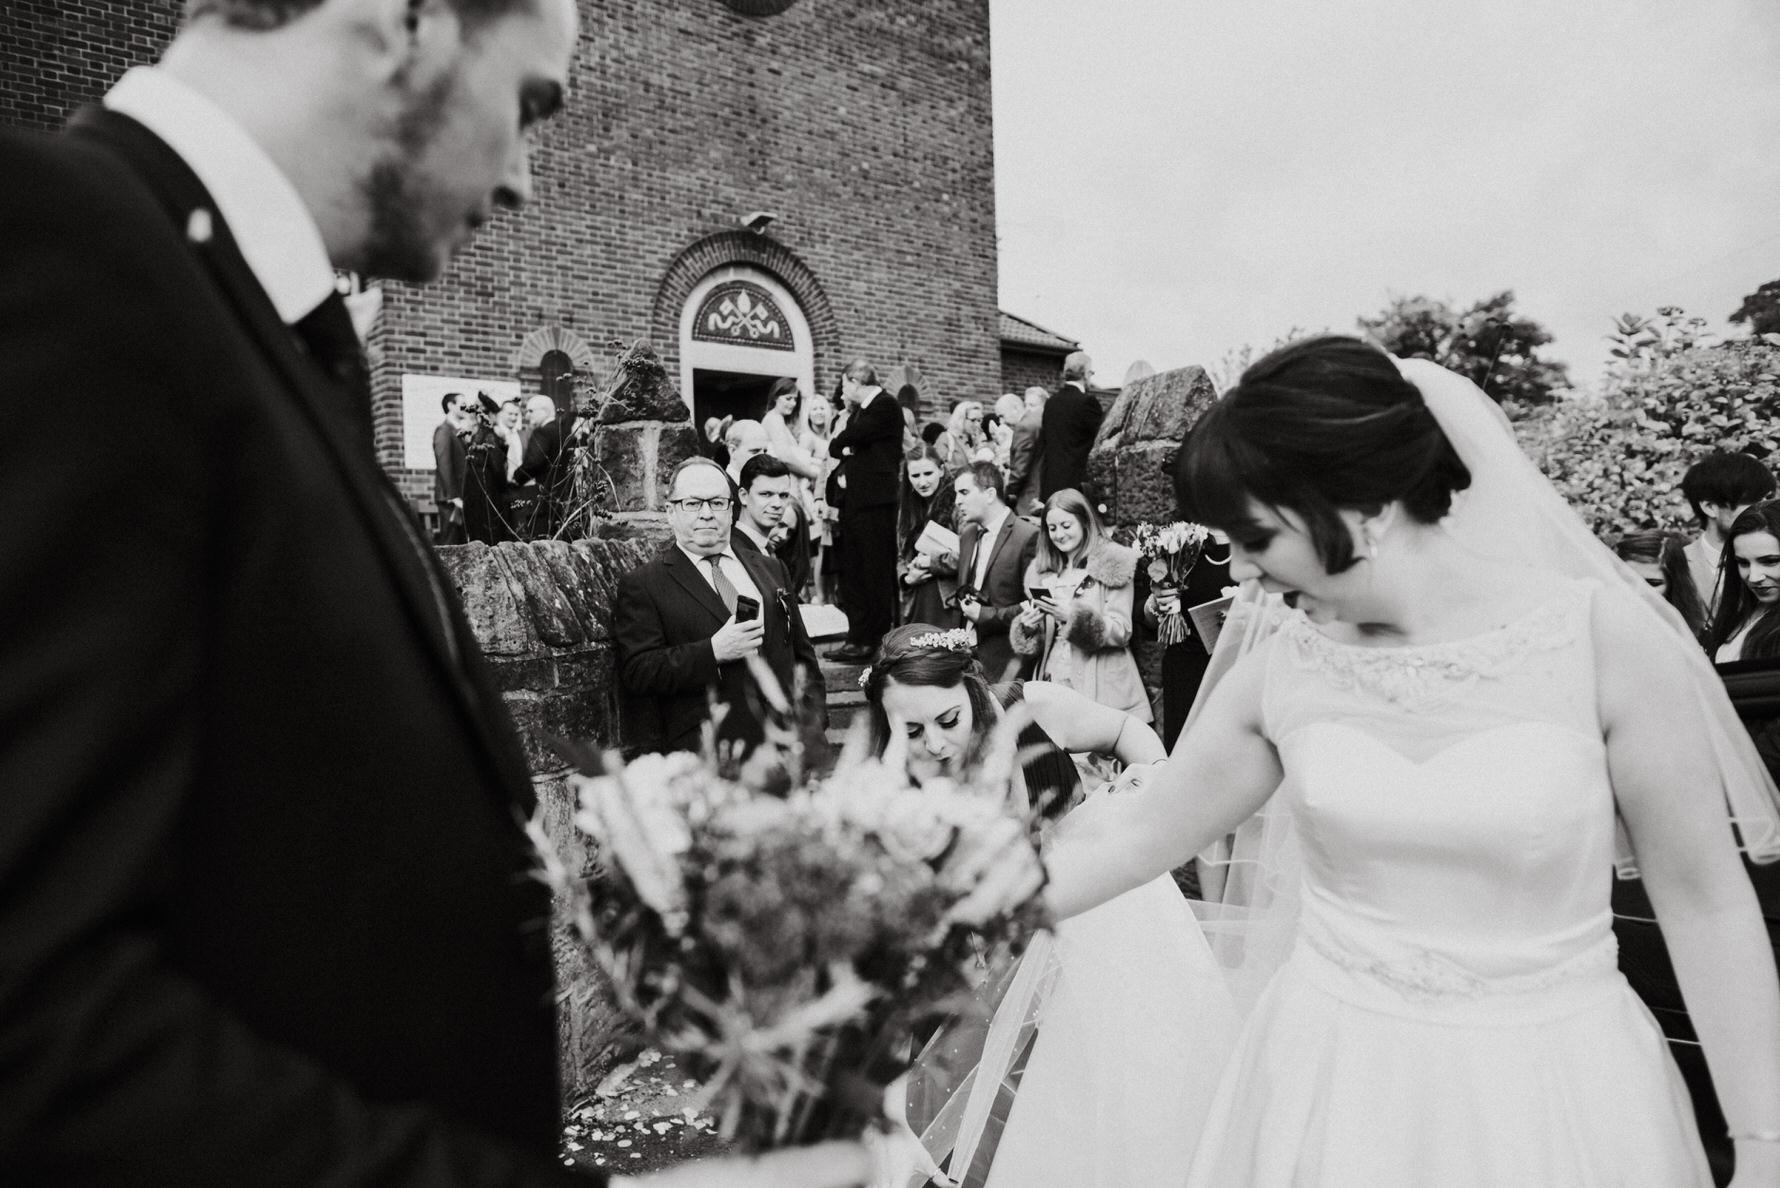 Cheshire Documentary Wedding Photography bride and groom